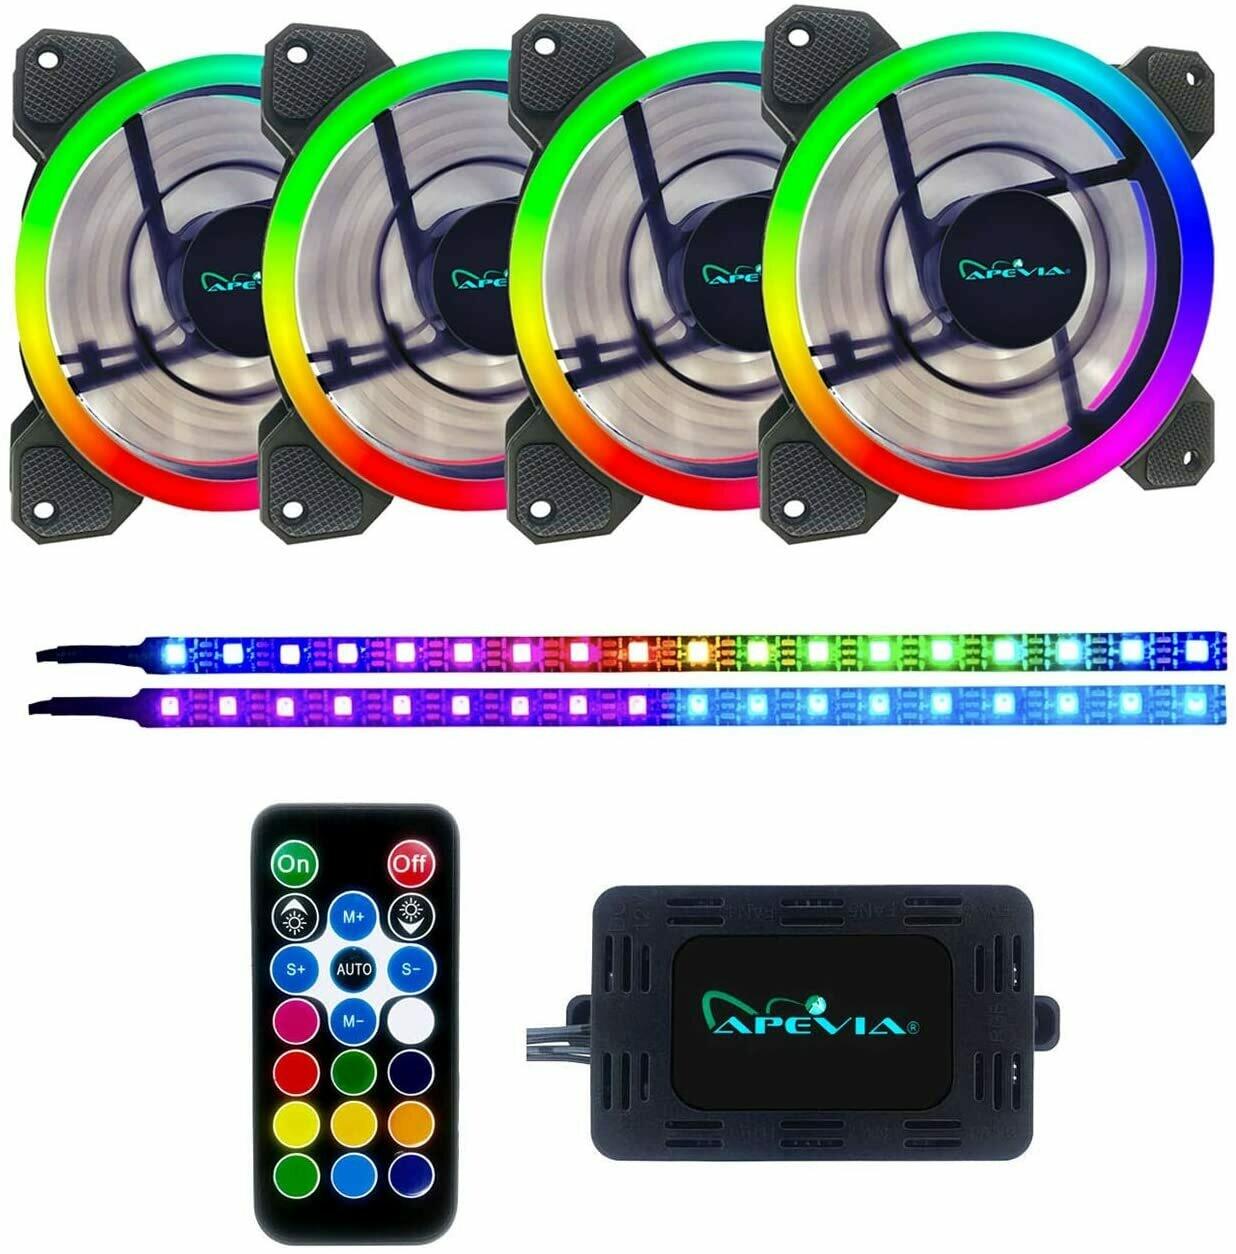 Apevia ST4P2-RGB Spectra 4-pack 120mm ARGB Case Fan + 2x ARGB LED Strip Cooling/Lighting Kit